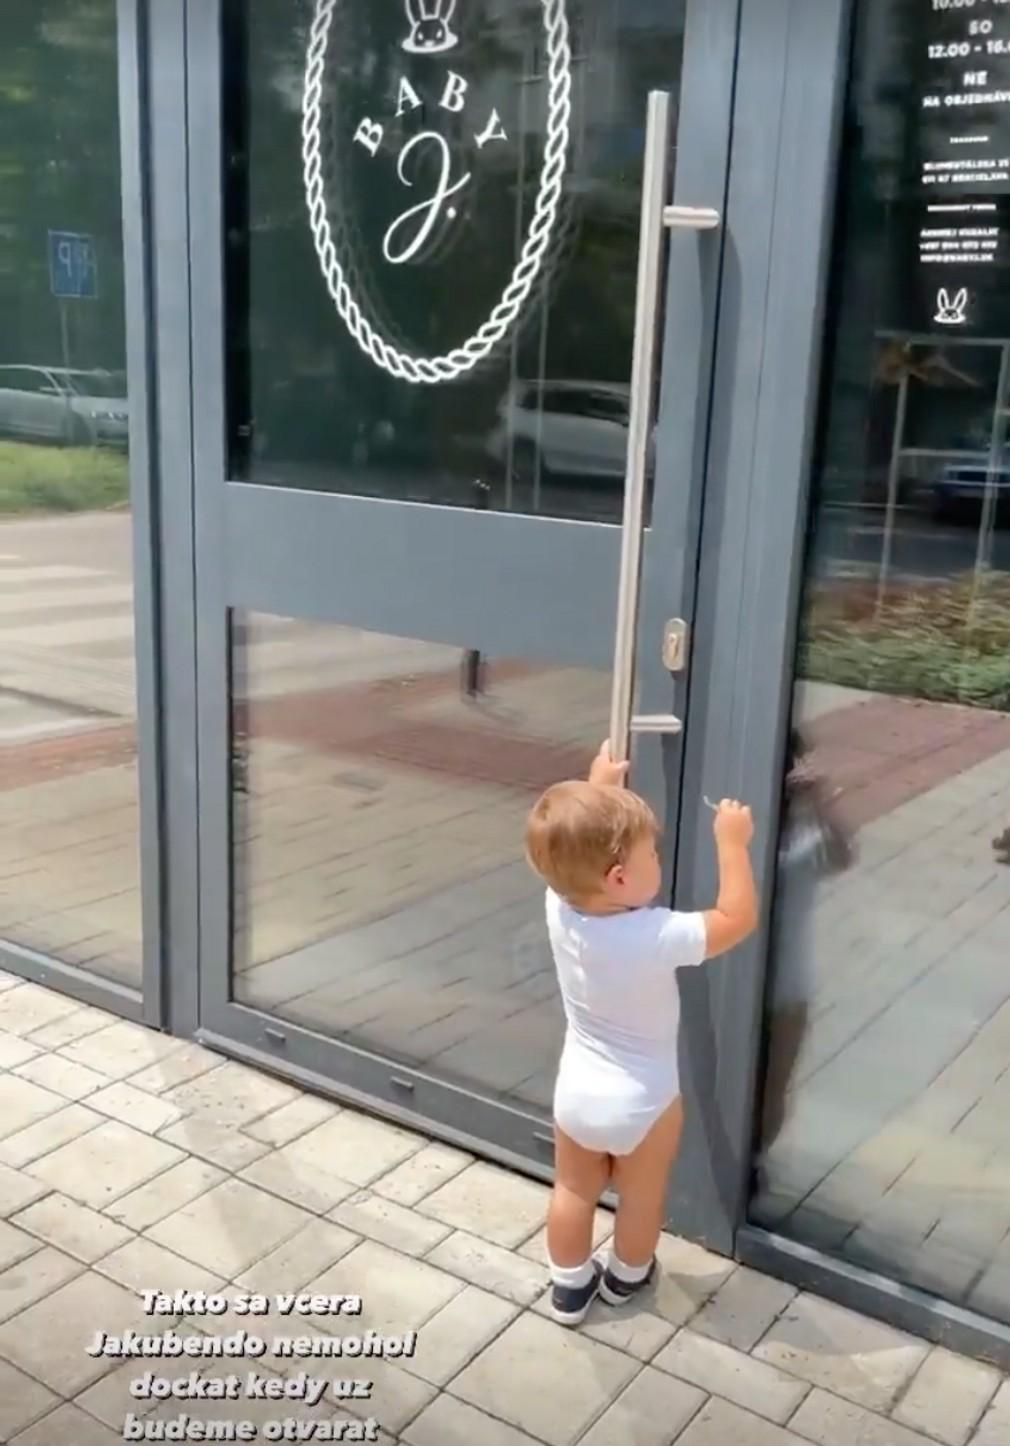 Dominika Cibulkova si otvára obchod